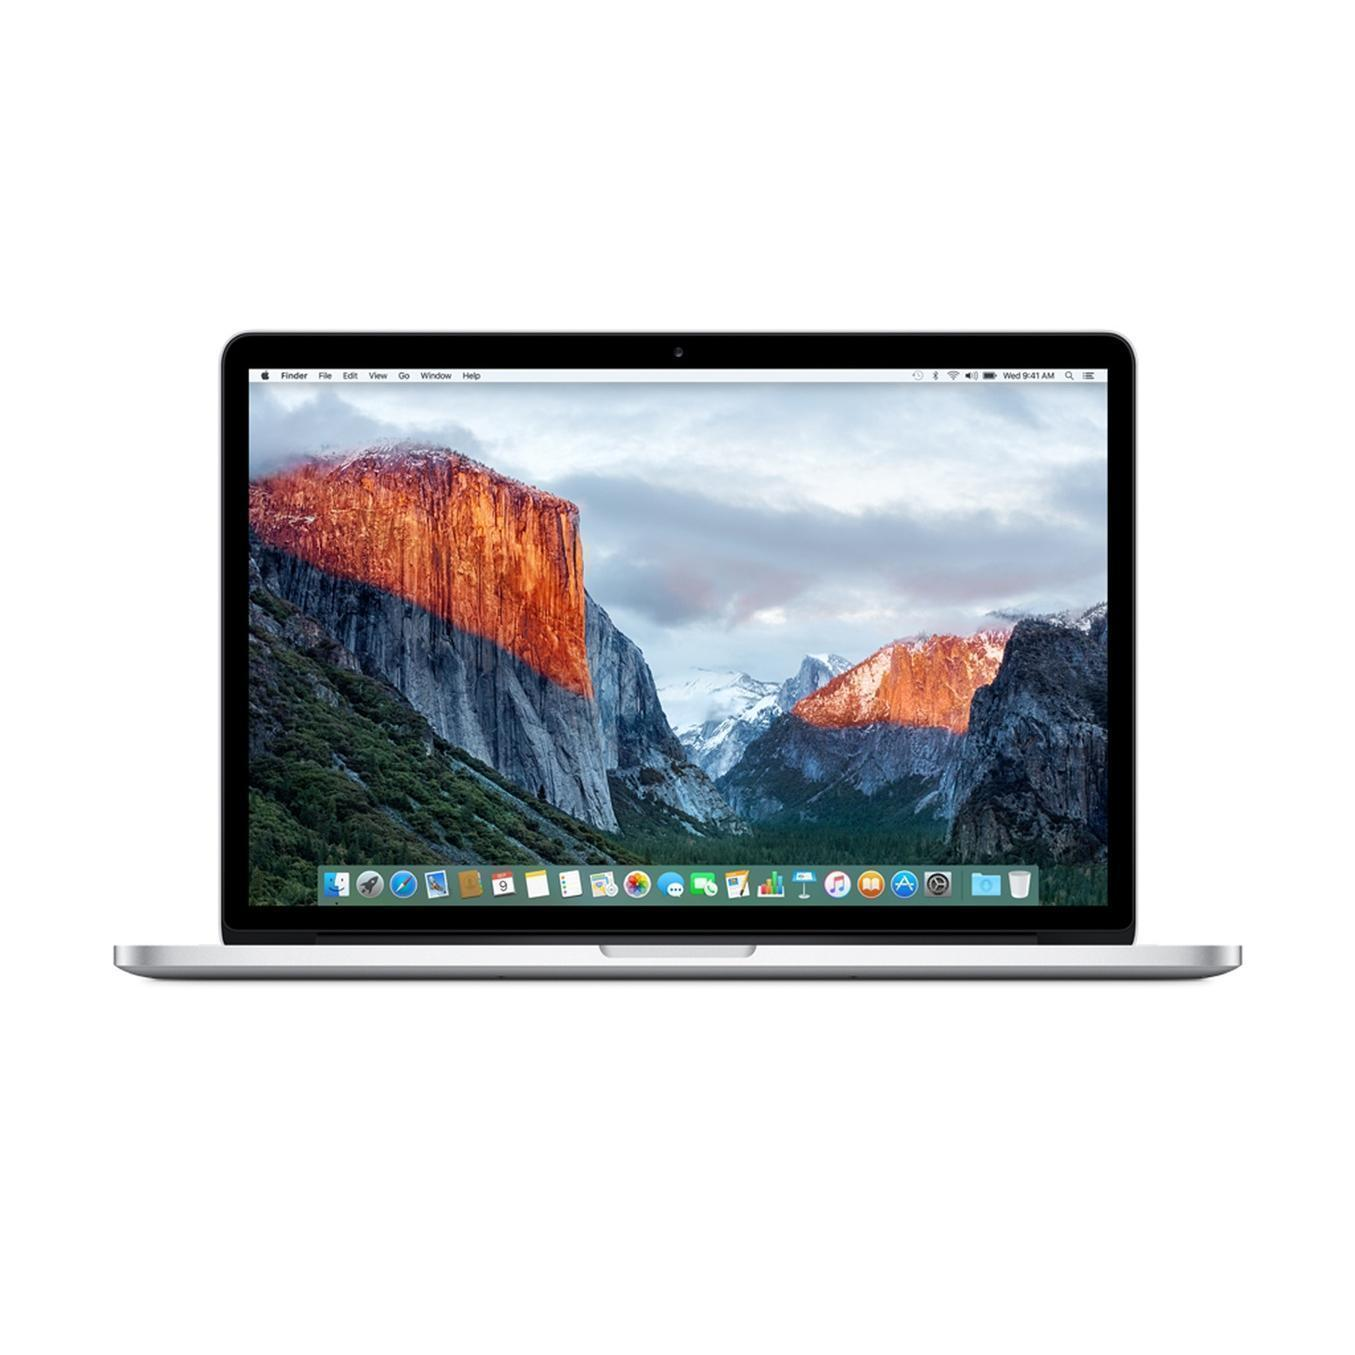 MacBook Pro Retina 15.4-inch (2014) - Core i7 - 16GB - SSD 1000 GB QWERTY